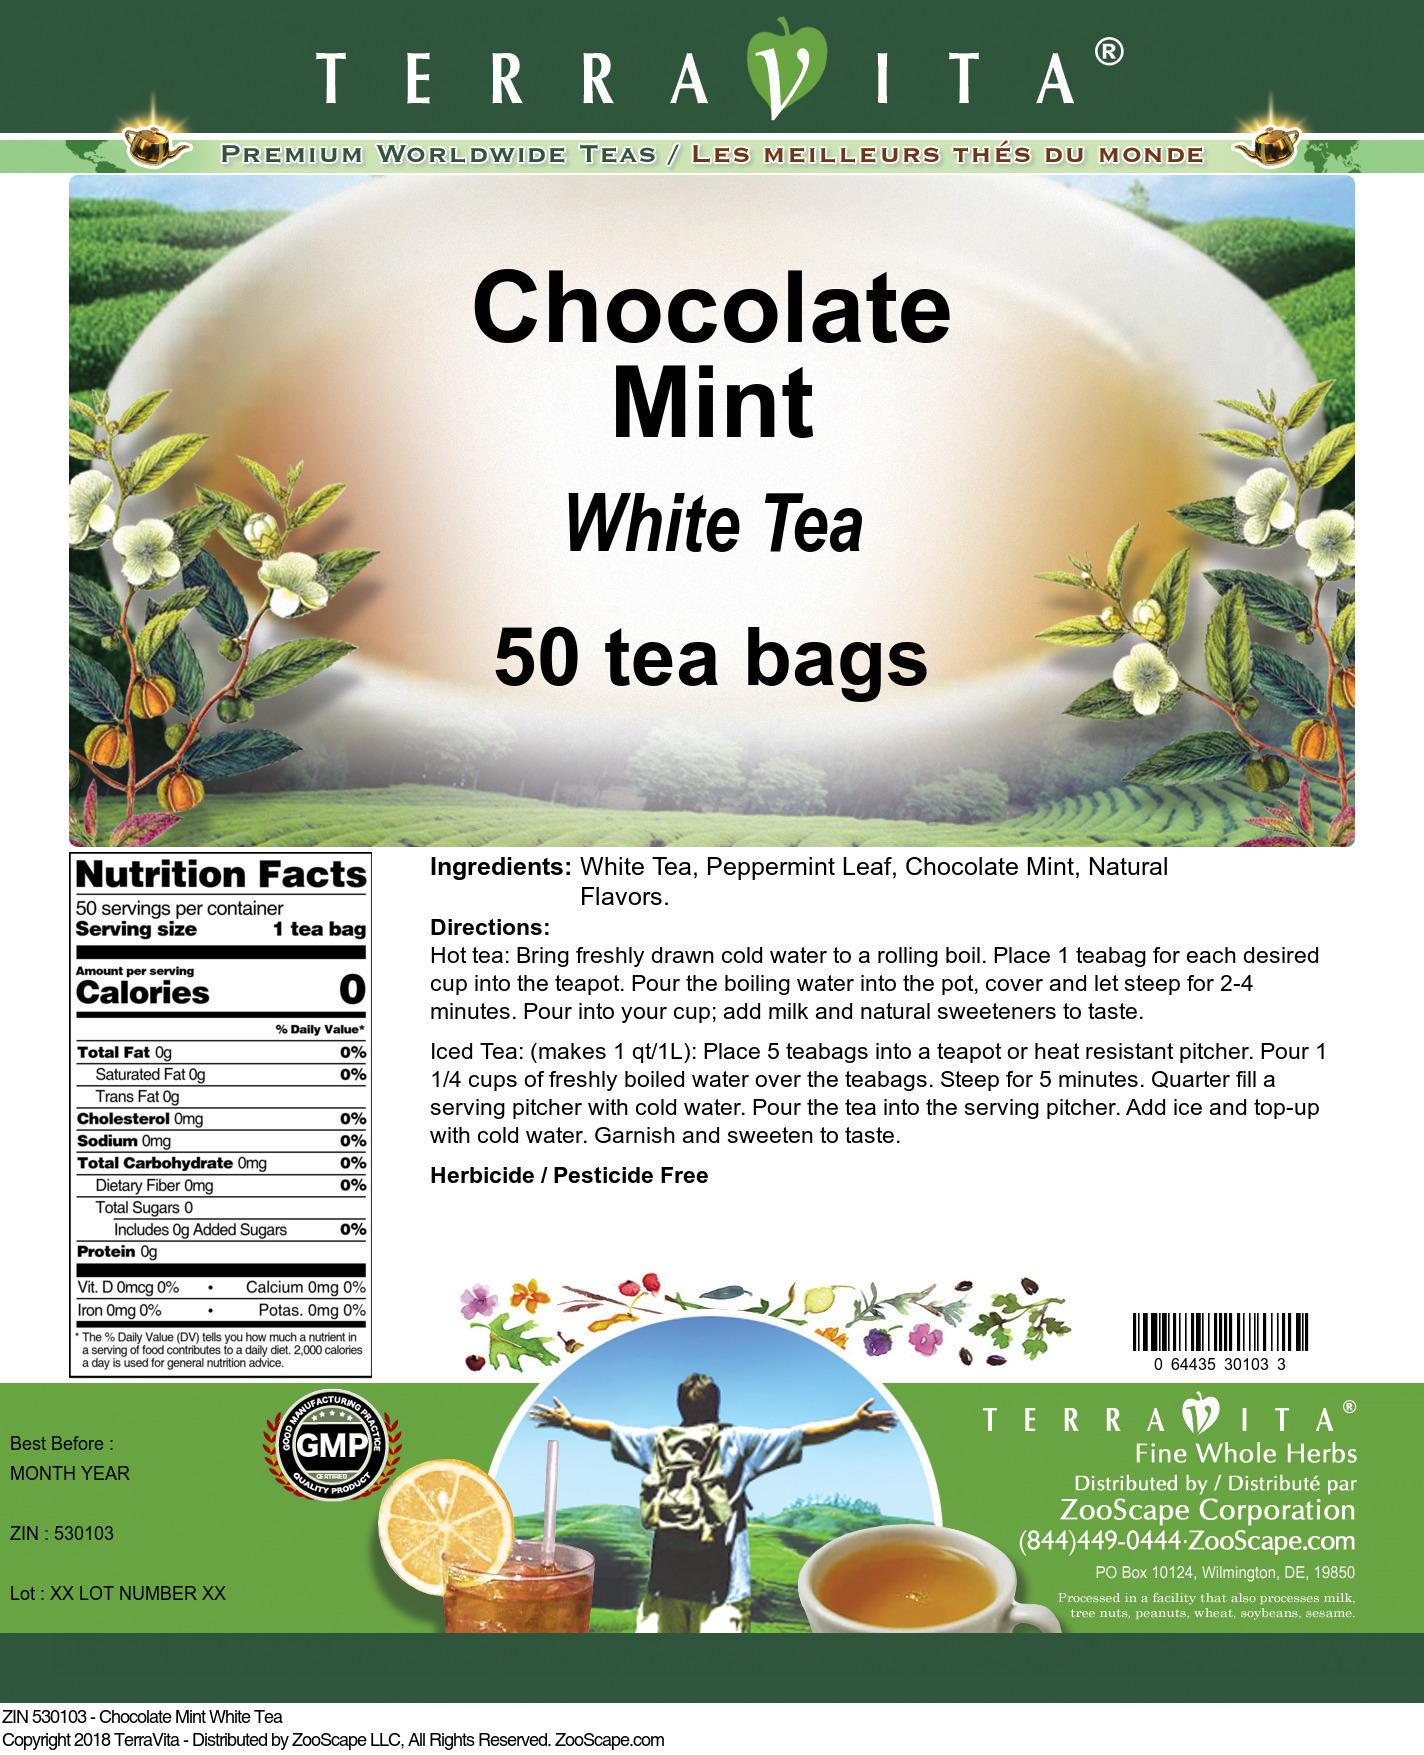 Chocolate Mint White Tea